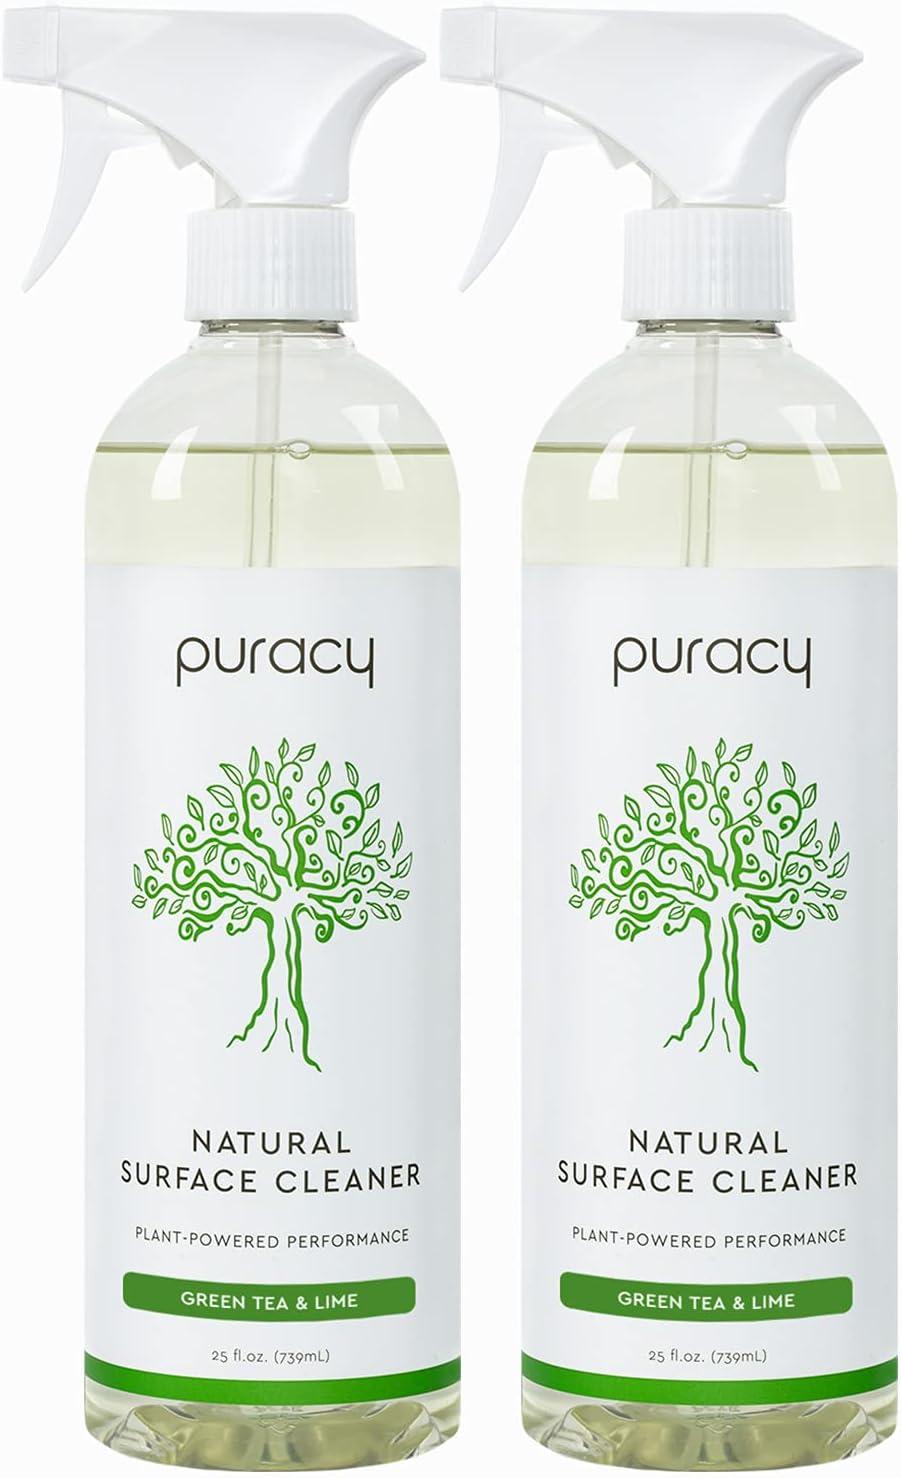 Puracy Streak-Free Surface Cleaner, Natural Household Cleaning Spray for Stainless Steel, Glass, Granite, Floors, Cars, 25 Fl Oz (2-Pack) : Health & Household